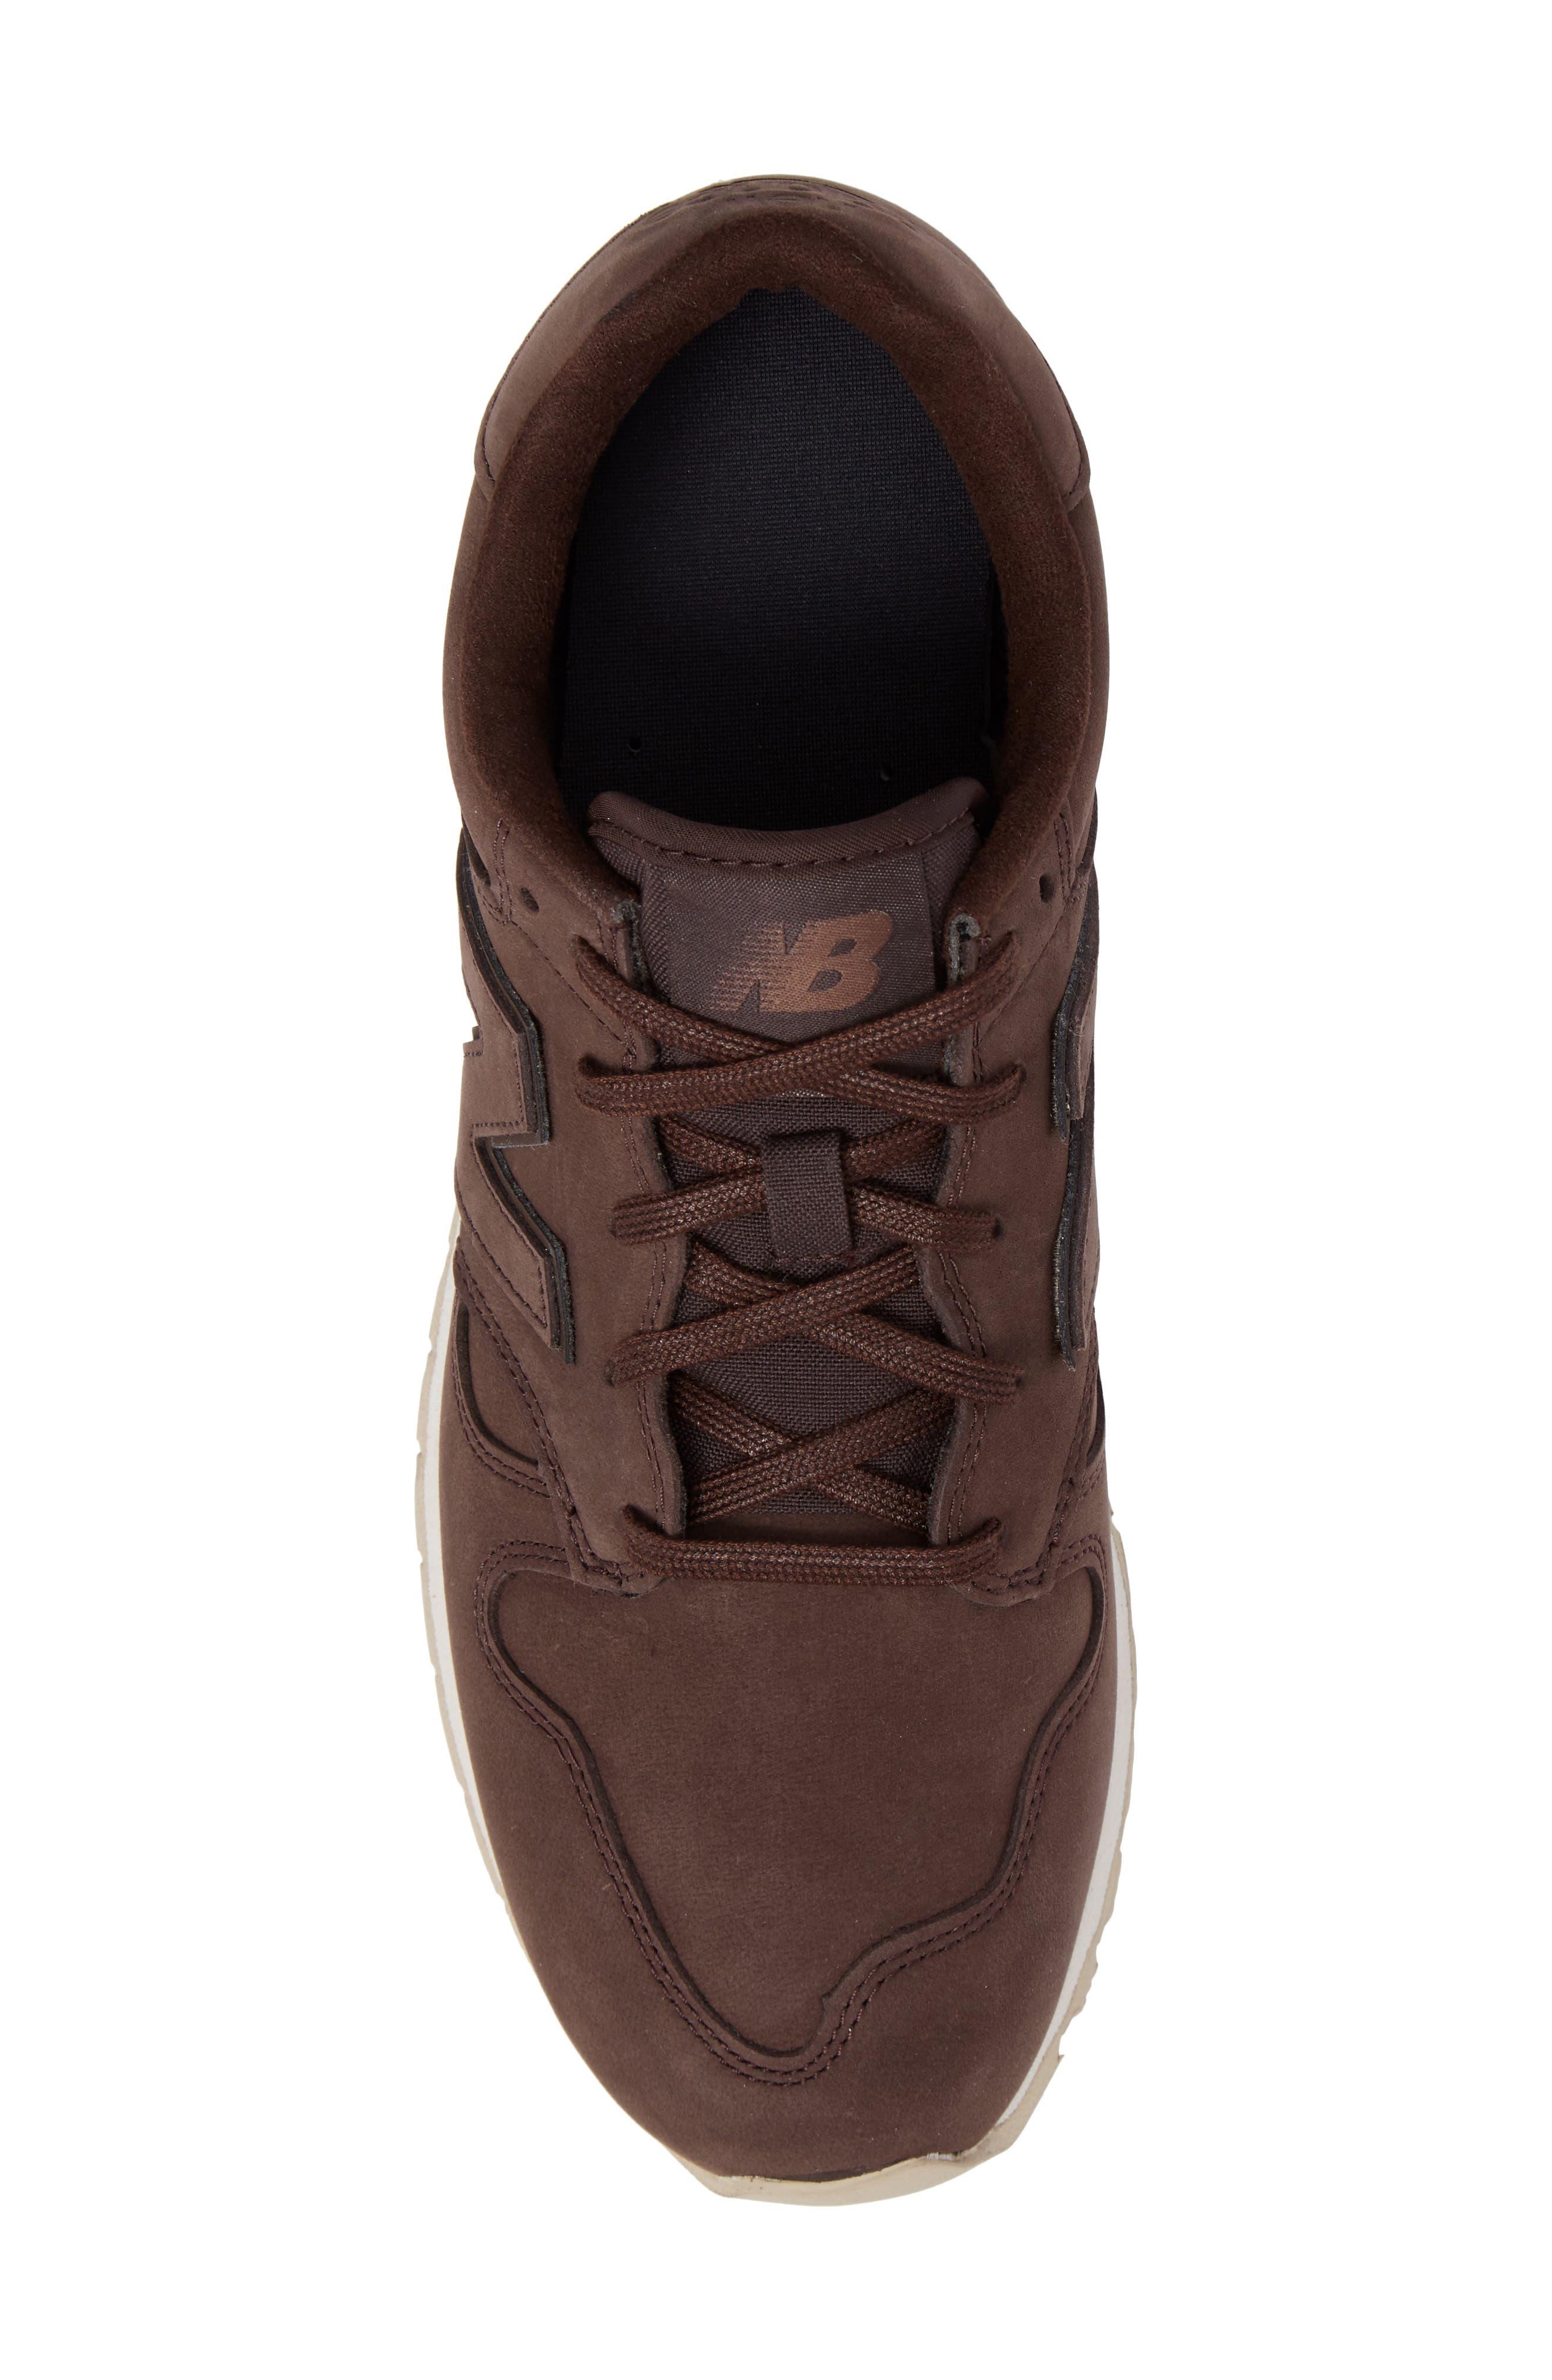 U520 Trainer Sneaker,                             Alternate thumbnail 9, color,